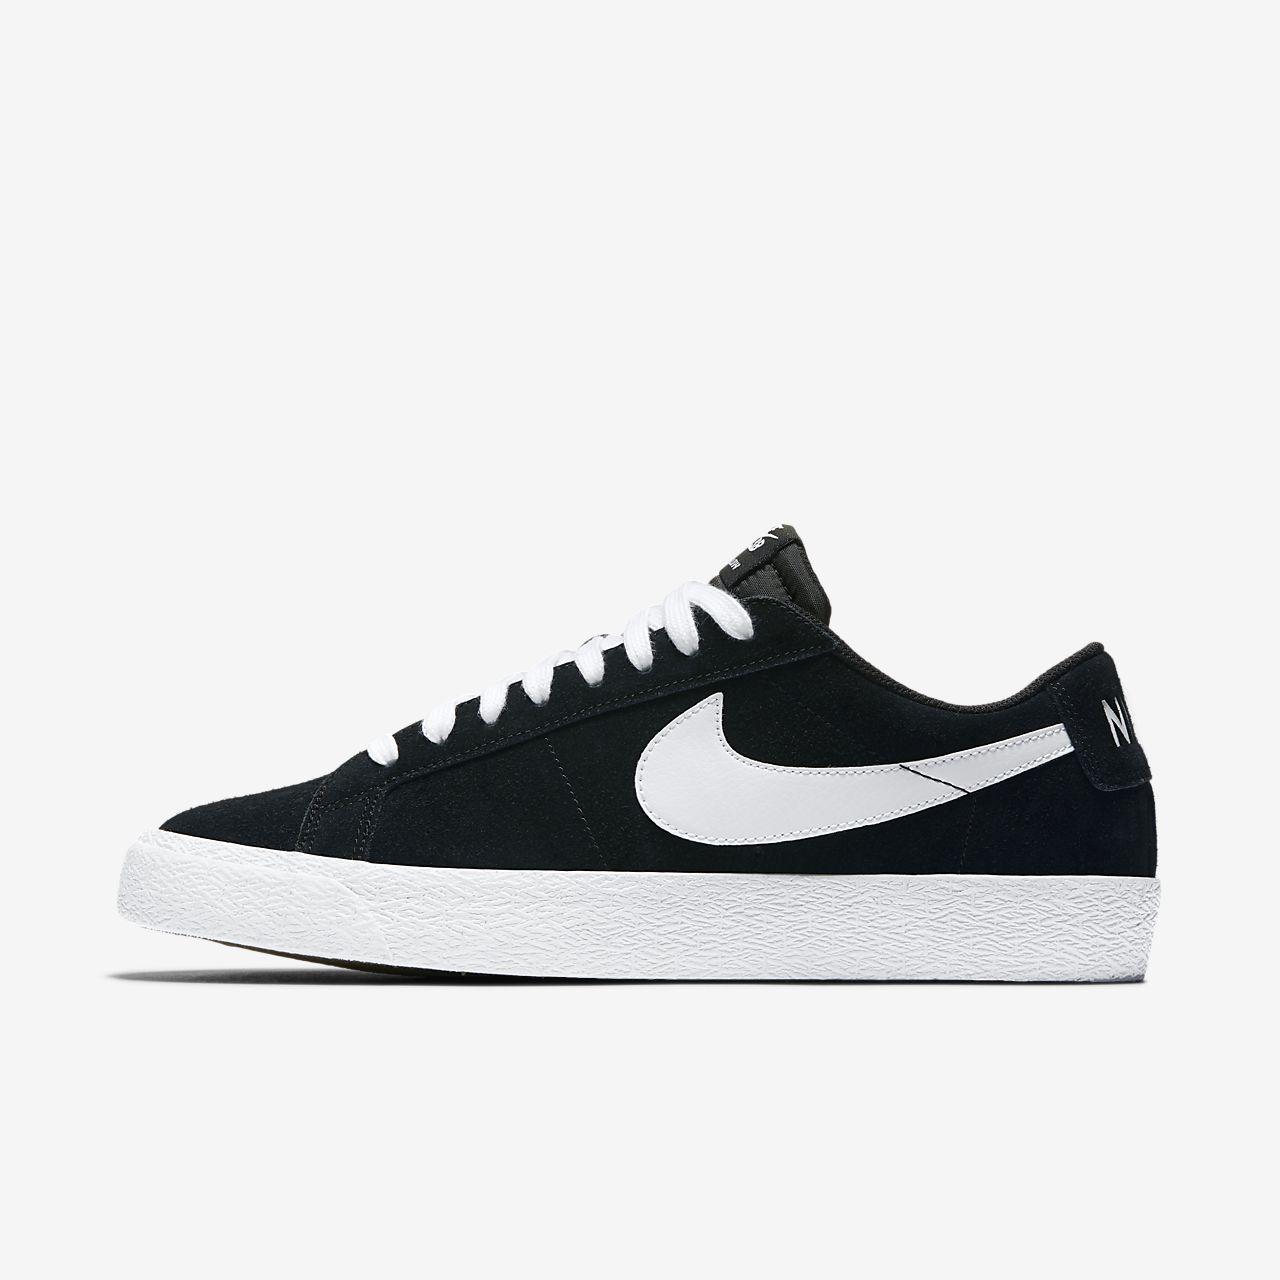 size 40 dee7e 368c7 ... Chaussure de skateboard Nike SB Blazer Zoom Low pour Homme